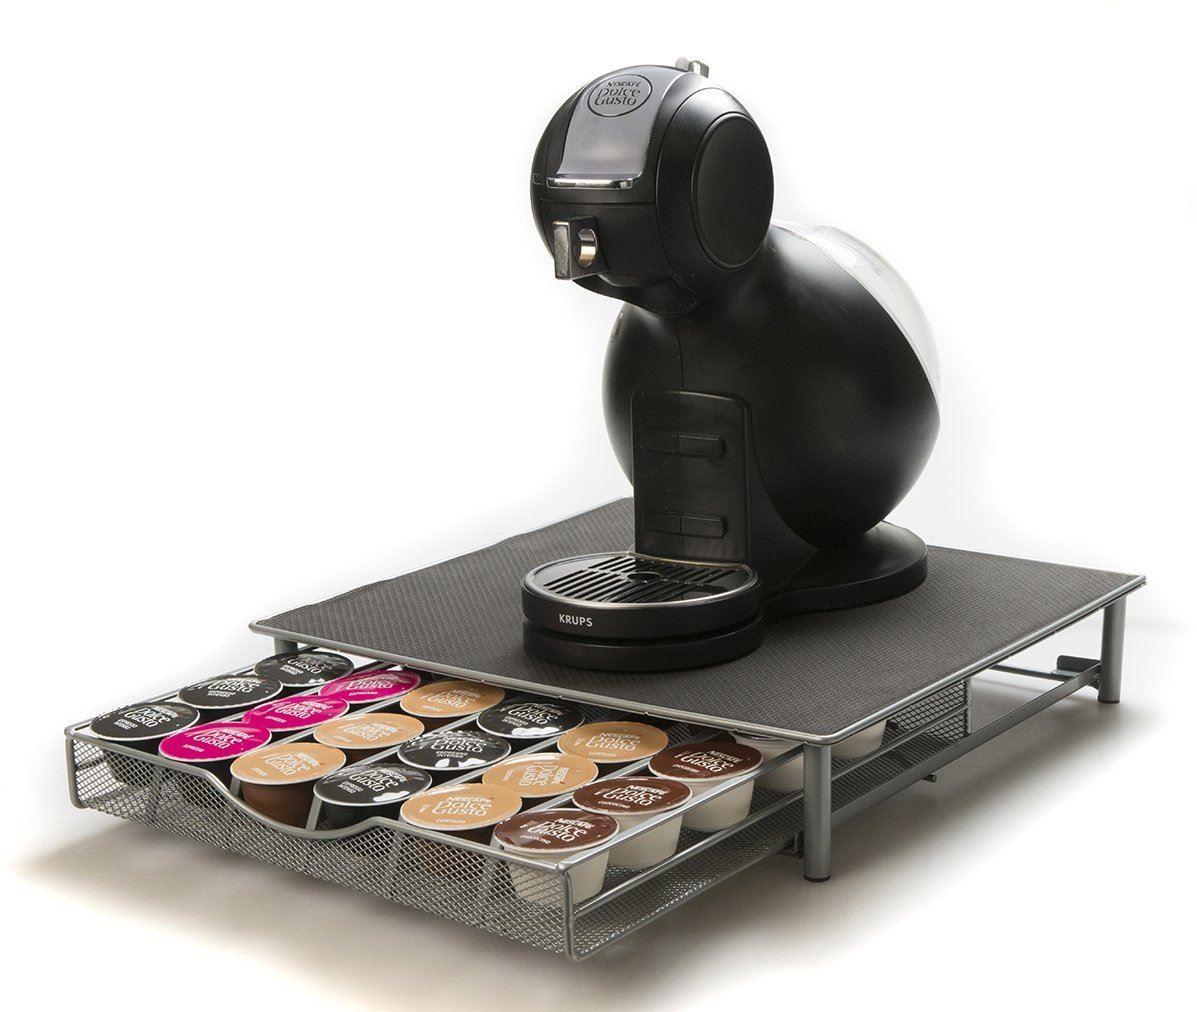 coffee machine stand 36 60 capsule pod holder storage drawer ebay. Black Bedroom Furniture Sets. Home Design Ideas